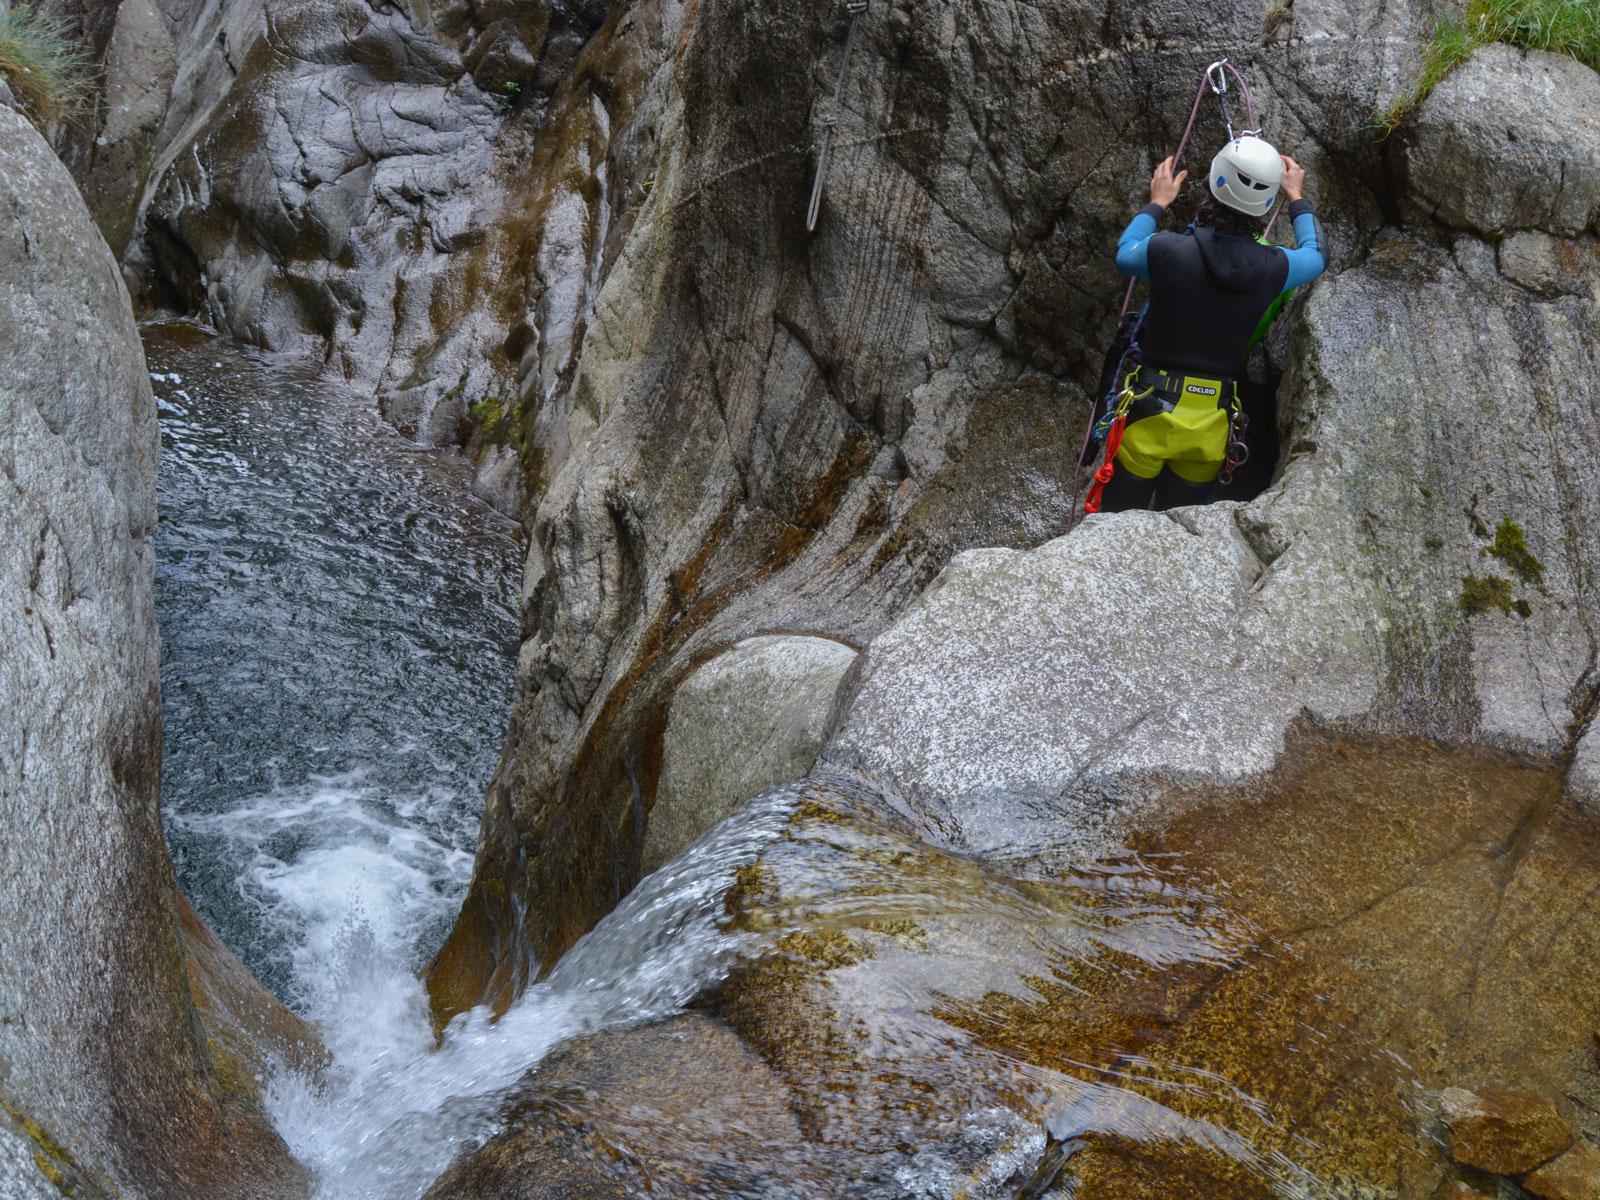 Gorges de Nuria, Catalunya 14